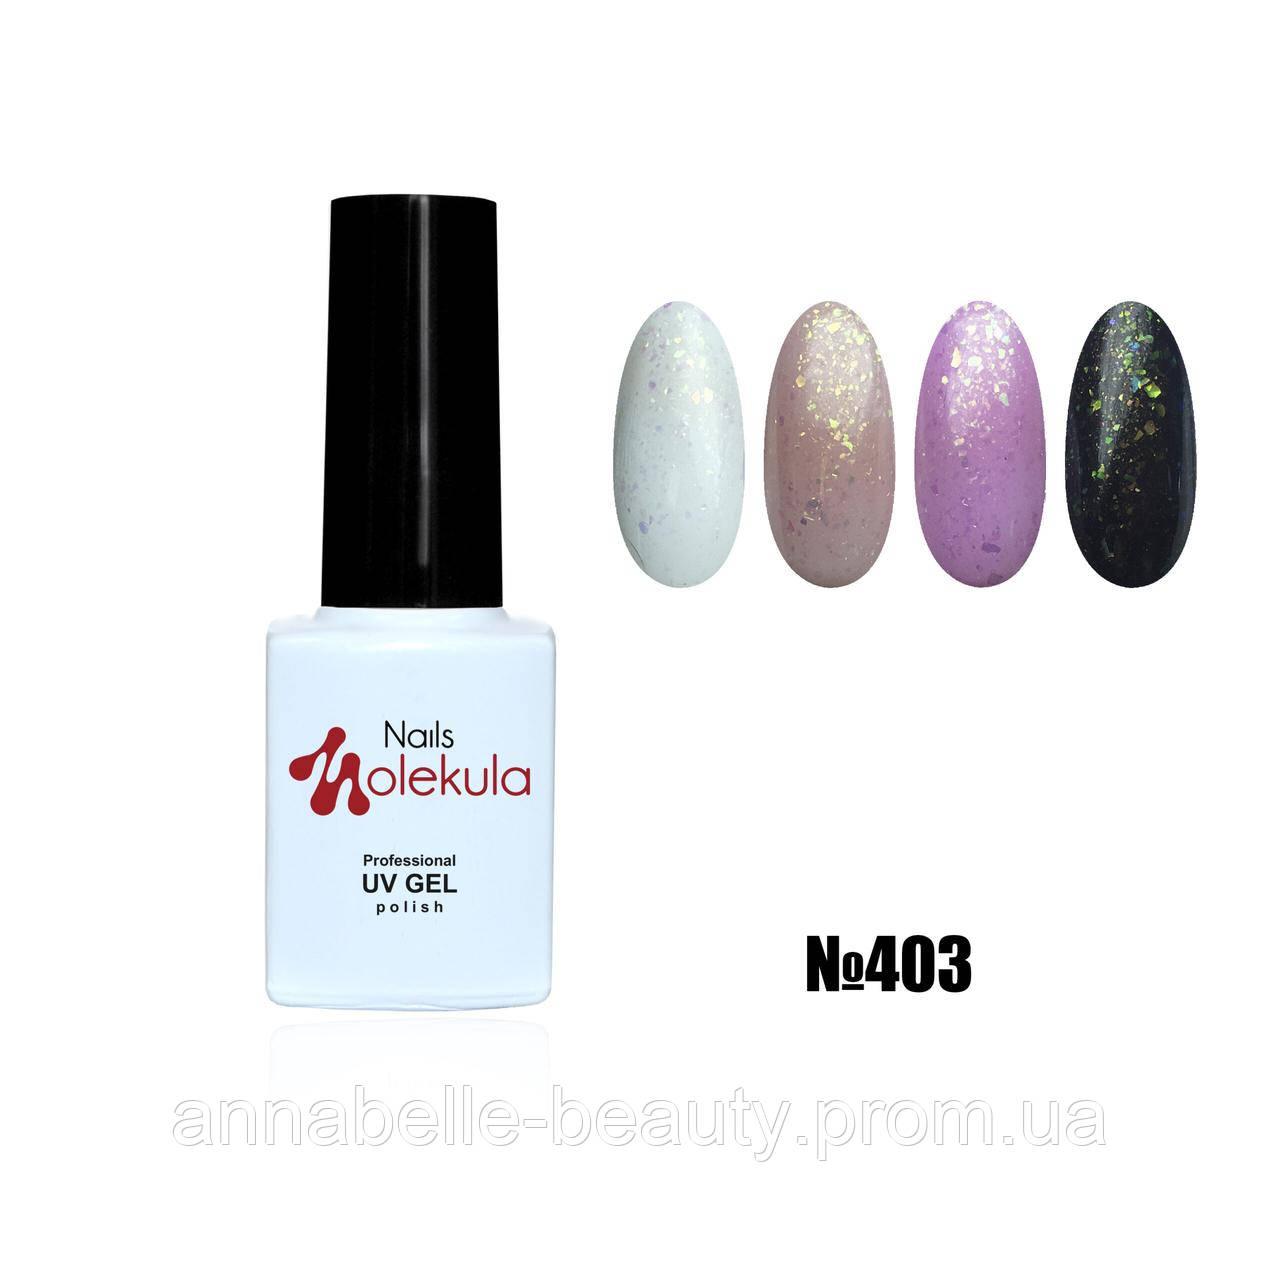 Molekula Гель-лак Galaxy gel 6мл №403